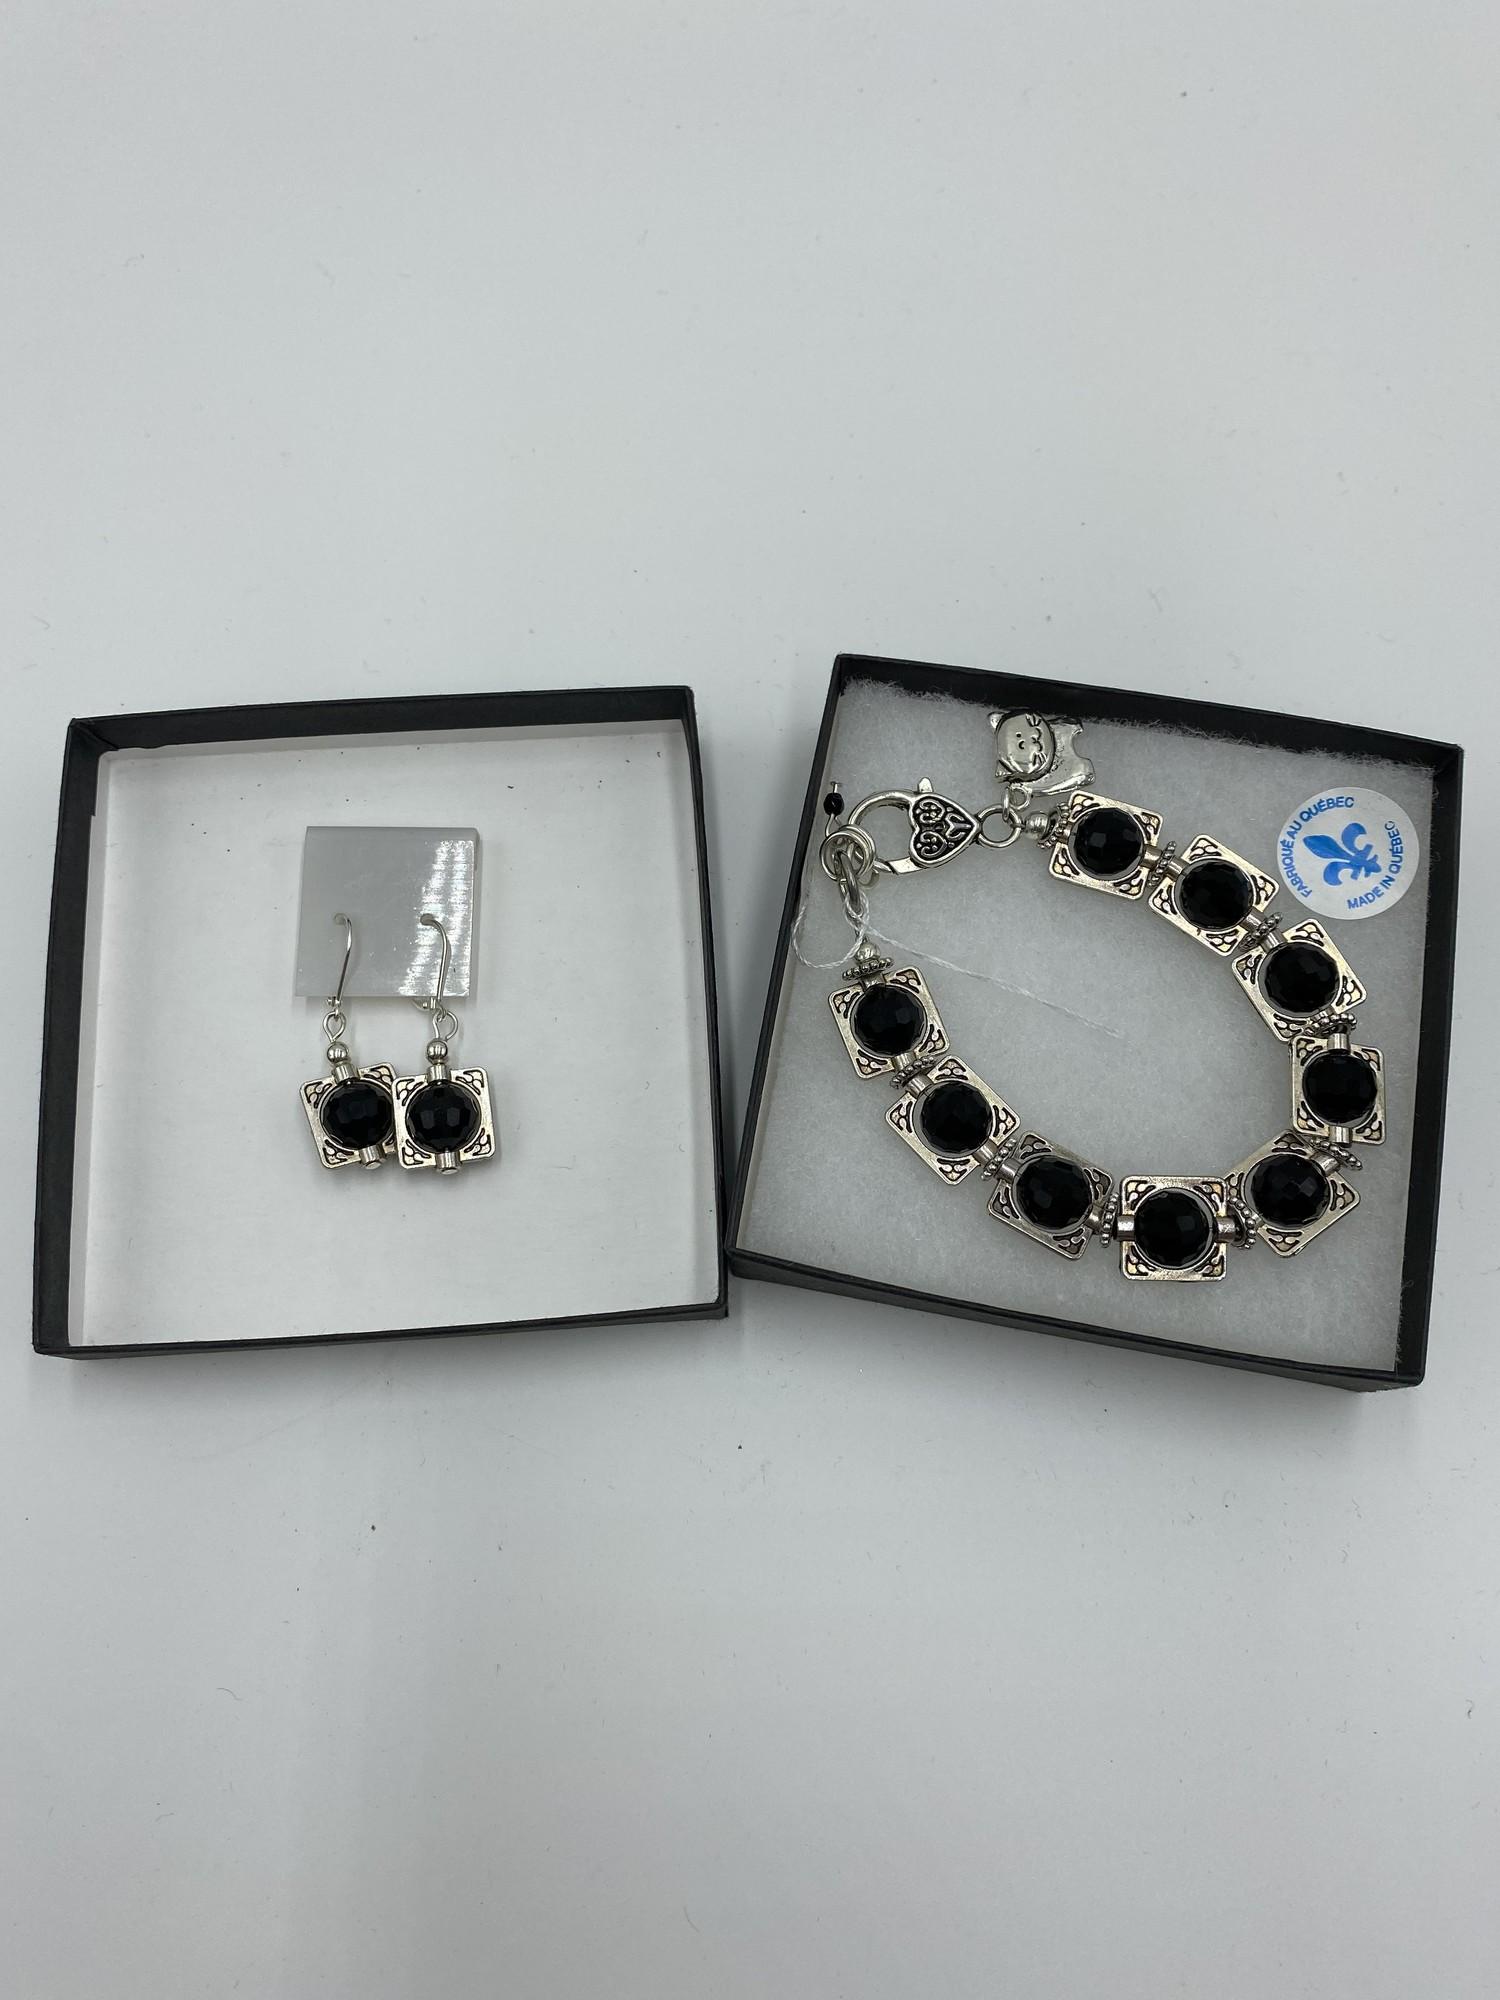 Bracelet/earings, Blk/slve, Size: None